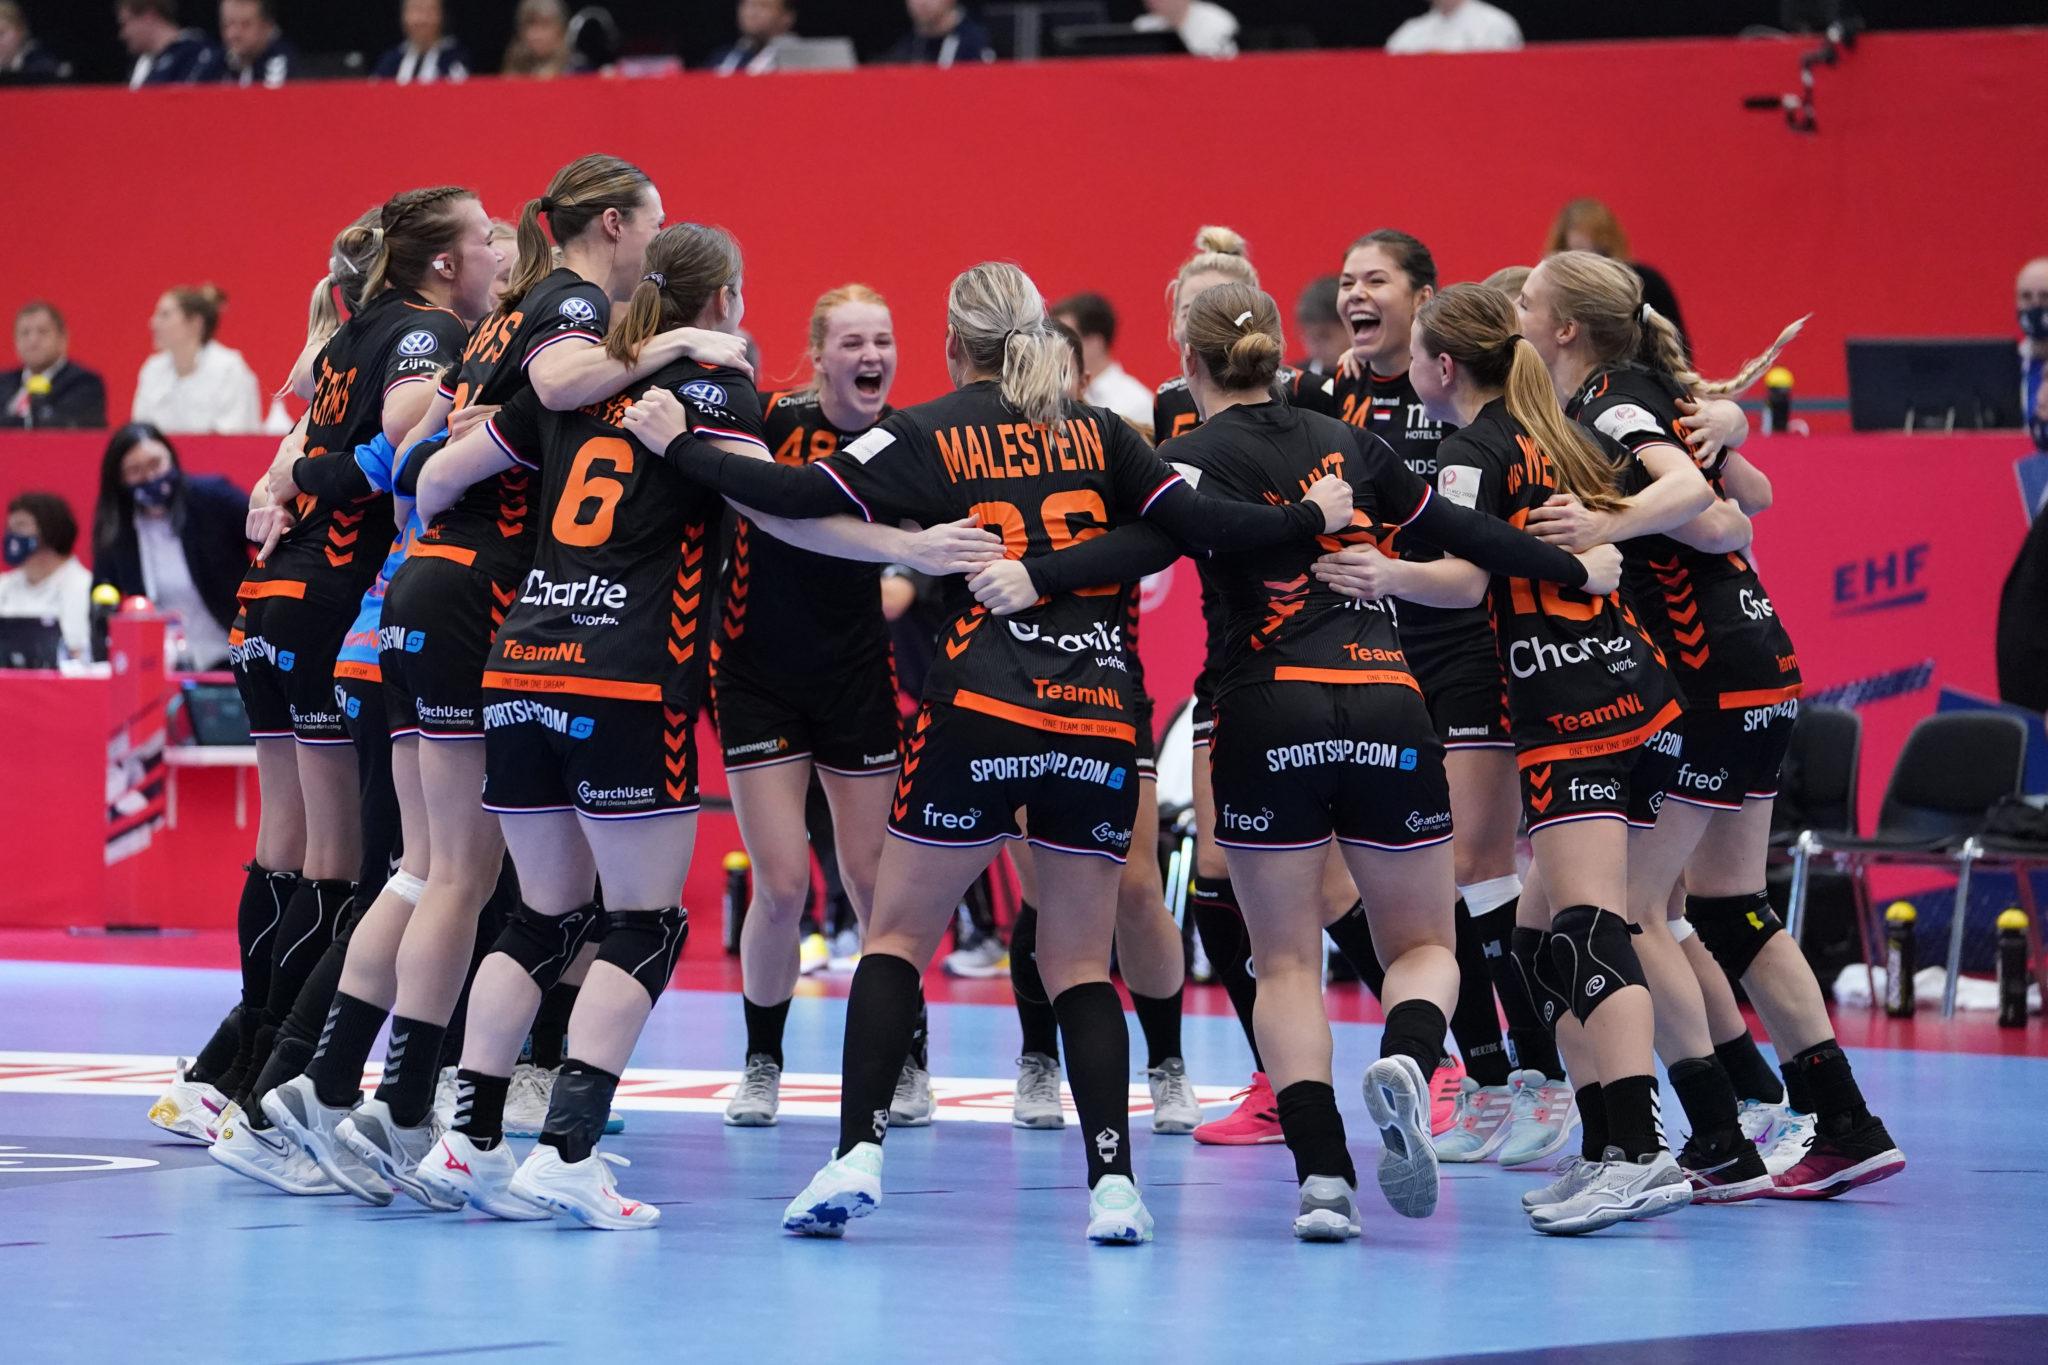 8-12-2020 HANDBAL:NEDERLAND-HONGARIJE:KOLDEN EURO 2020 Dames EK Handbal In Denemarken Nederland-Hongarije